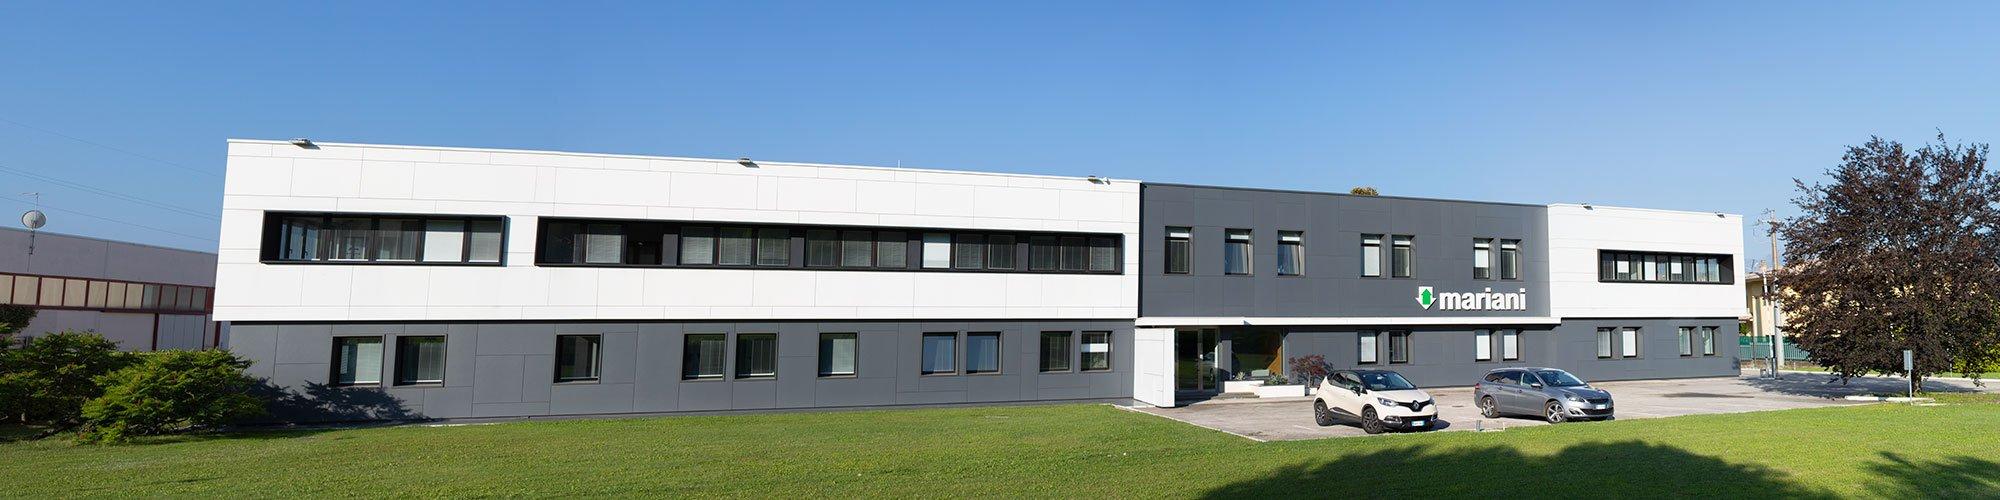 Headquarters - Mariani Srl